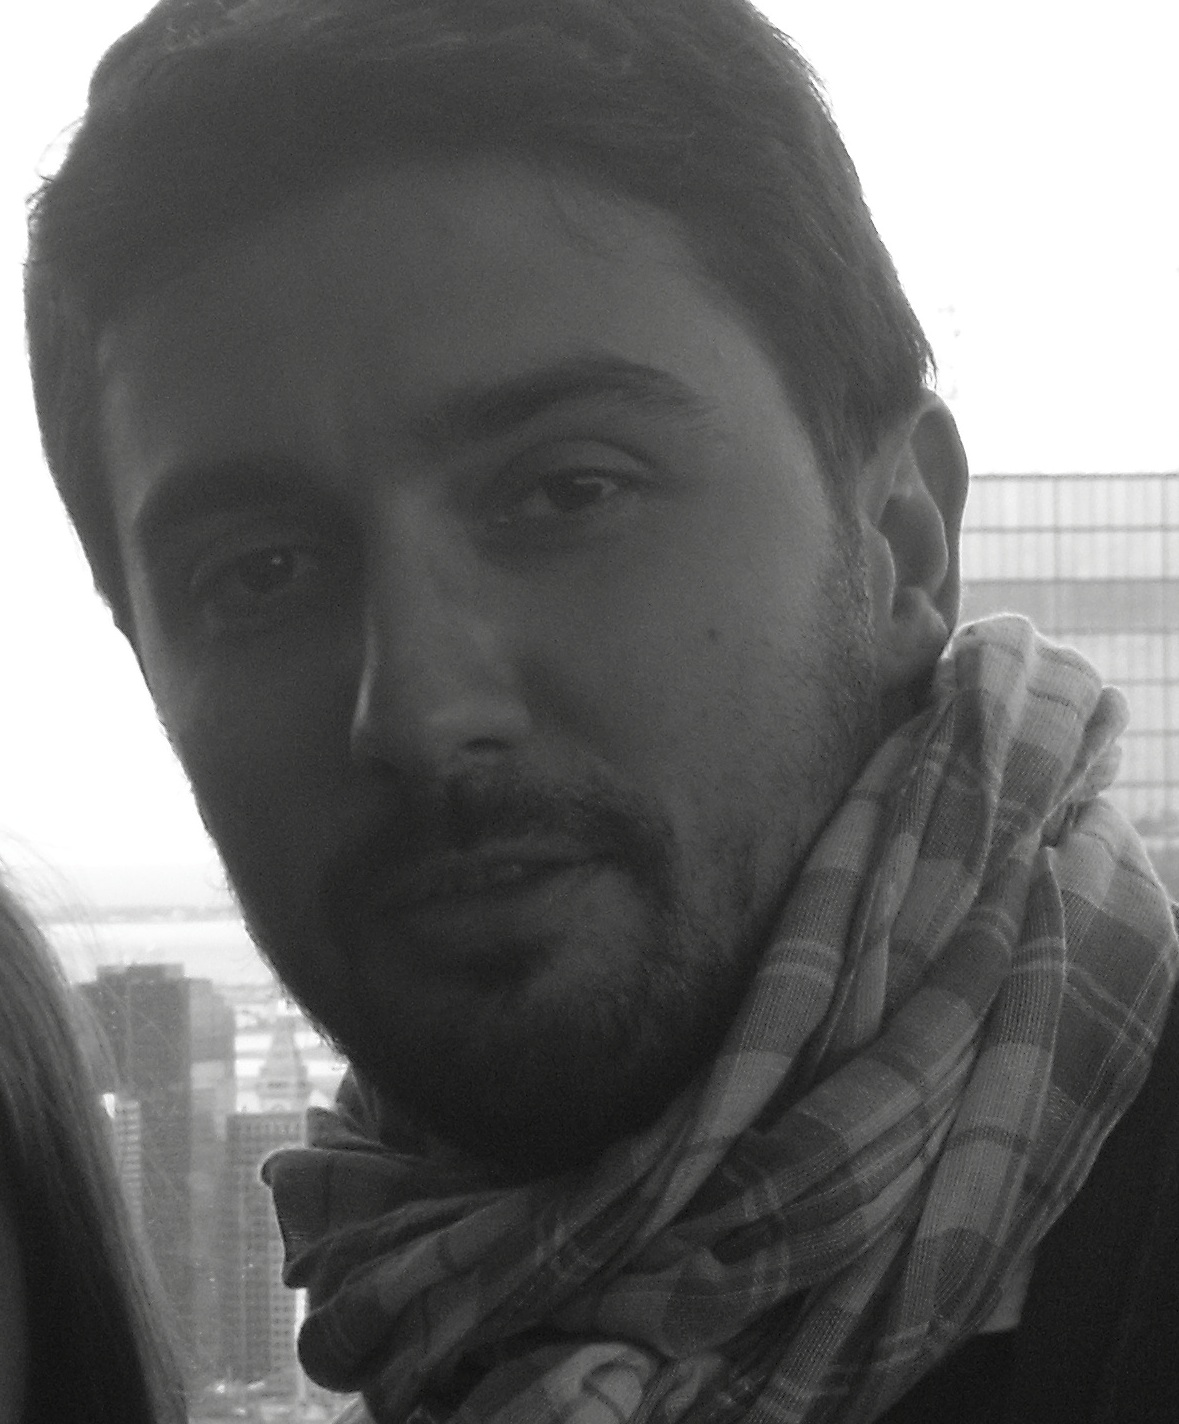 Michele Battistoni